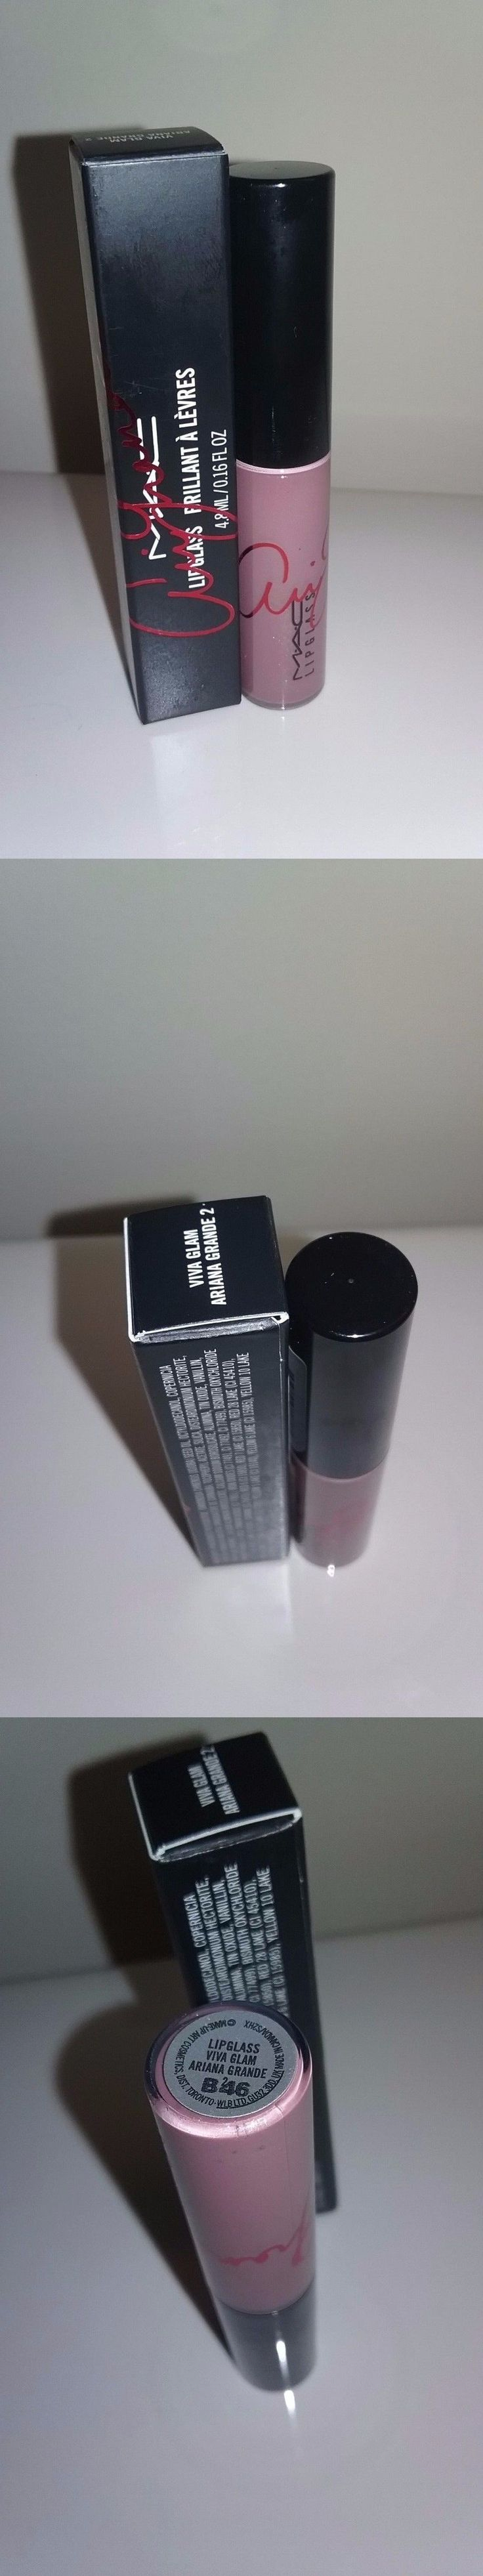 Lip Gloss: Nib Mac Viva Glam Ariana Grande 2 Lipglass Lip Gloss Full Size Shimmer .16 Oz -> BUY IT NOW ONLY: $36 on eBay!